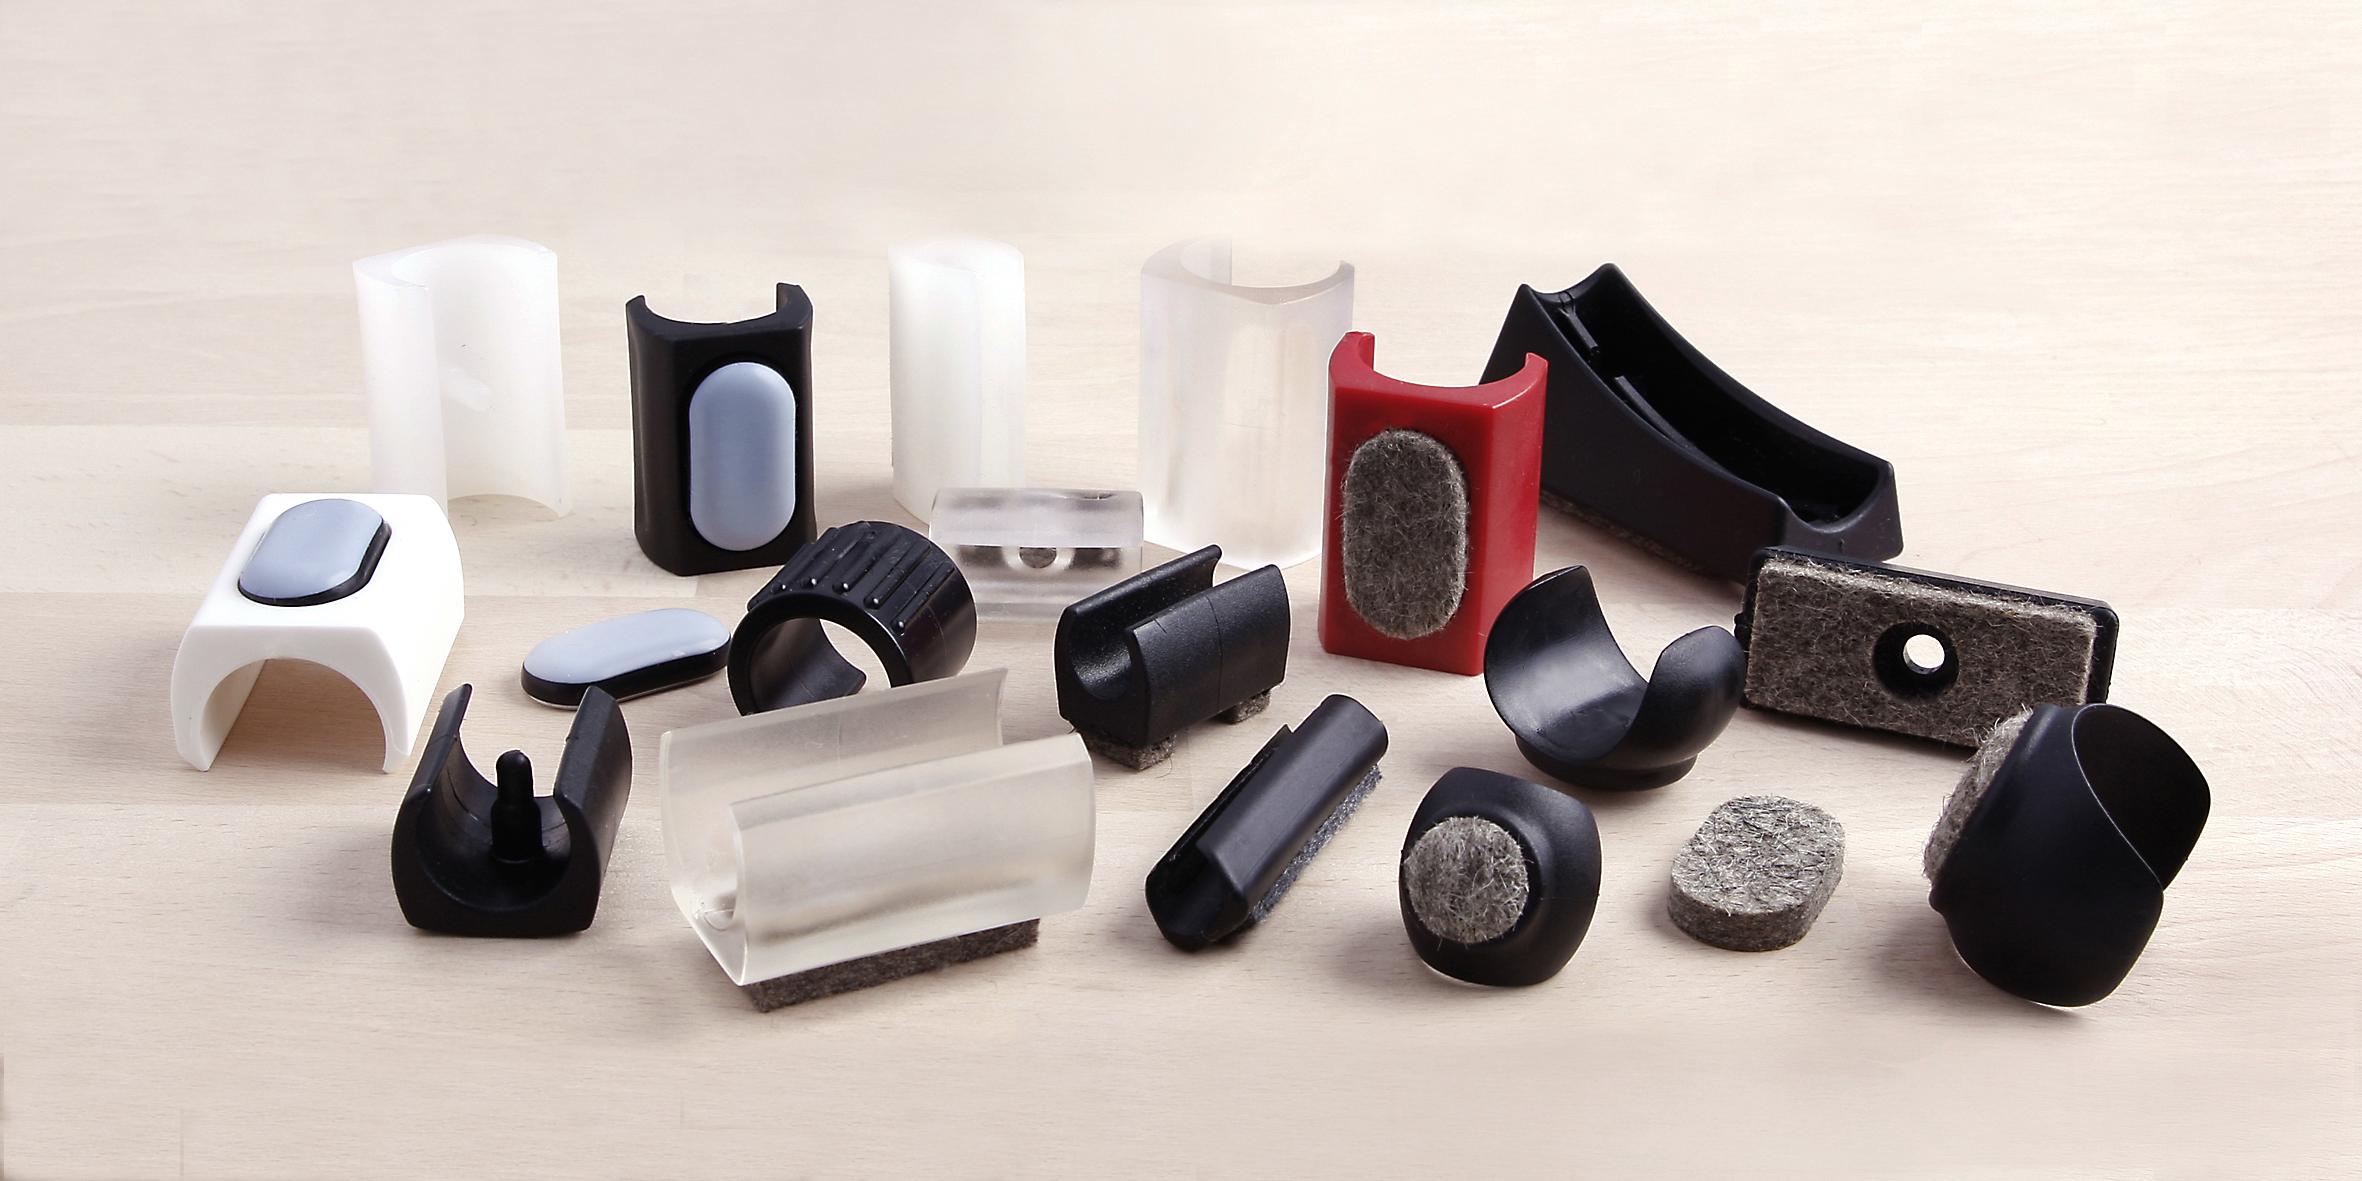 m belgleiter blog wissenswertes rund ums thema m belgleiter. Black Bedroom Furniture Sets. Home Design Ideas